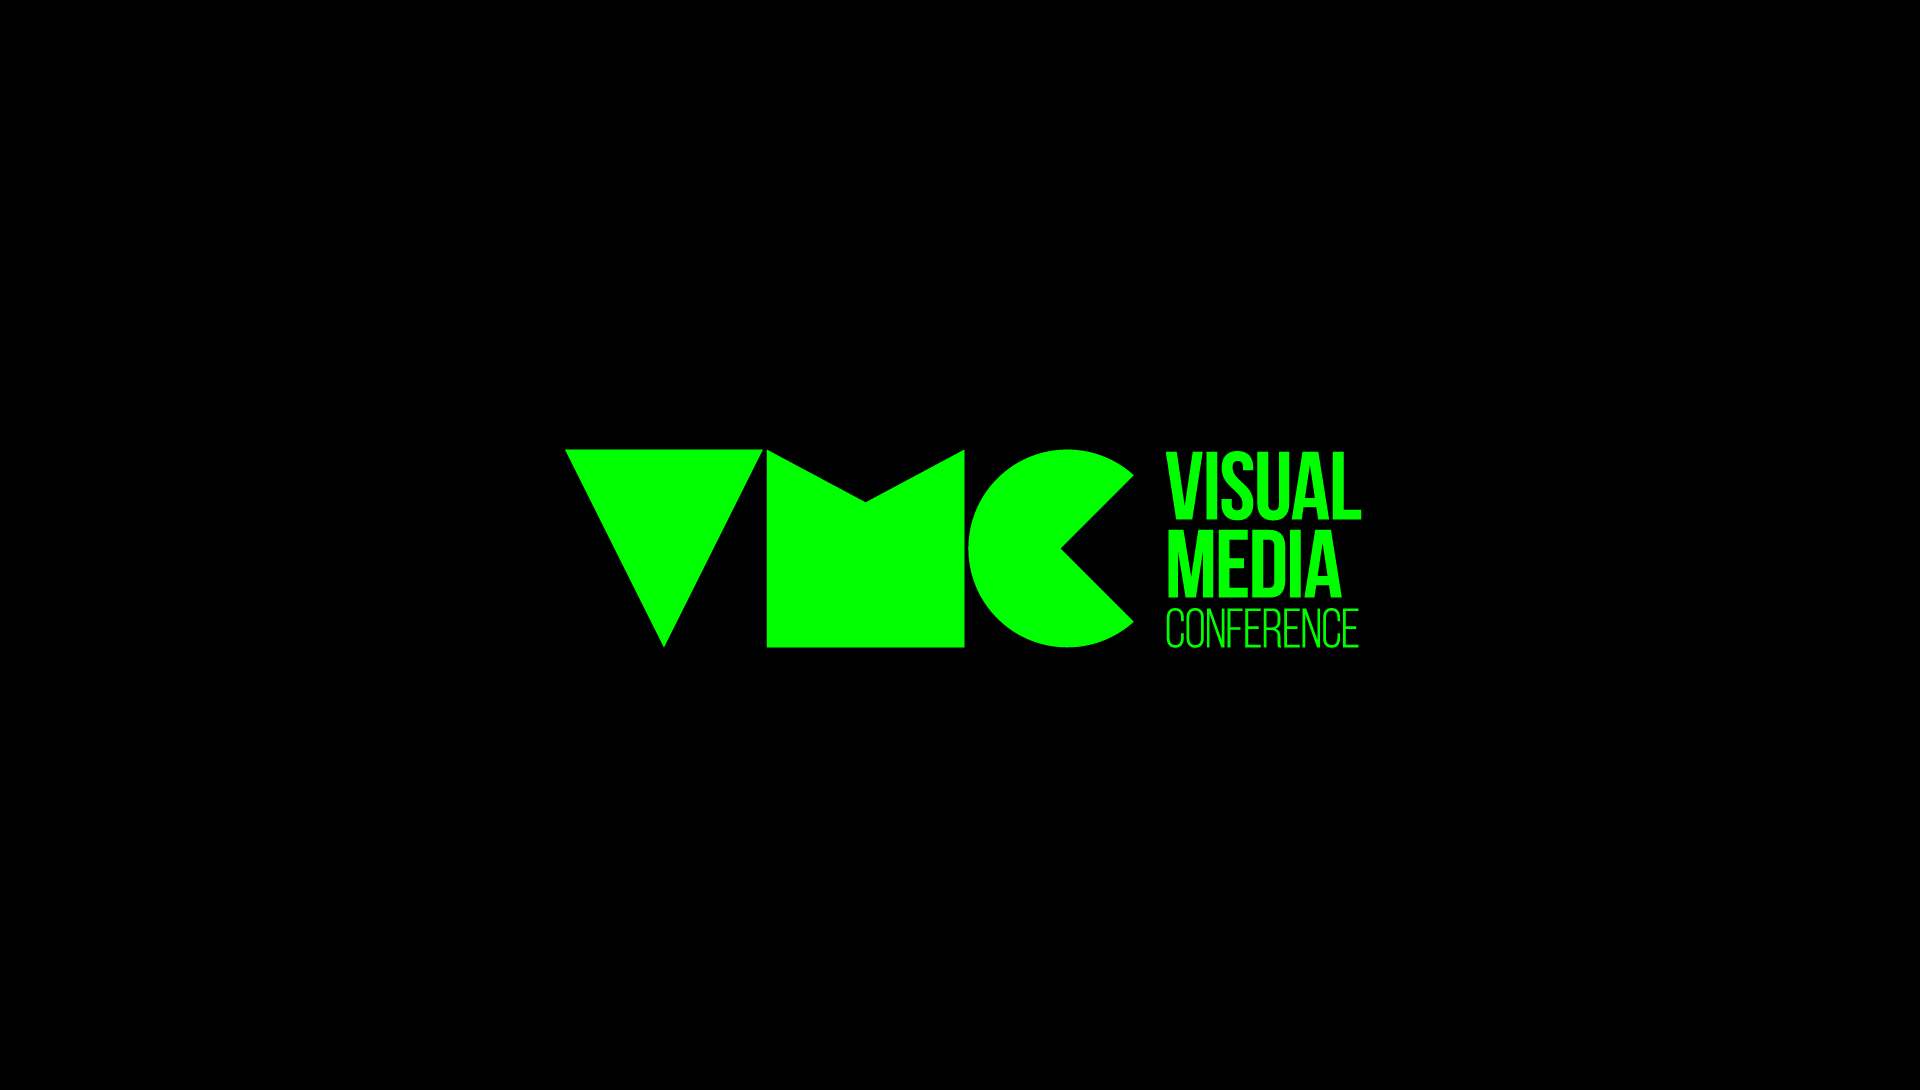 Visual Media Conference 2020 - Virtual Teaser